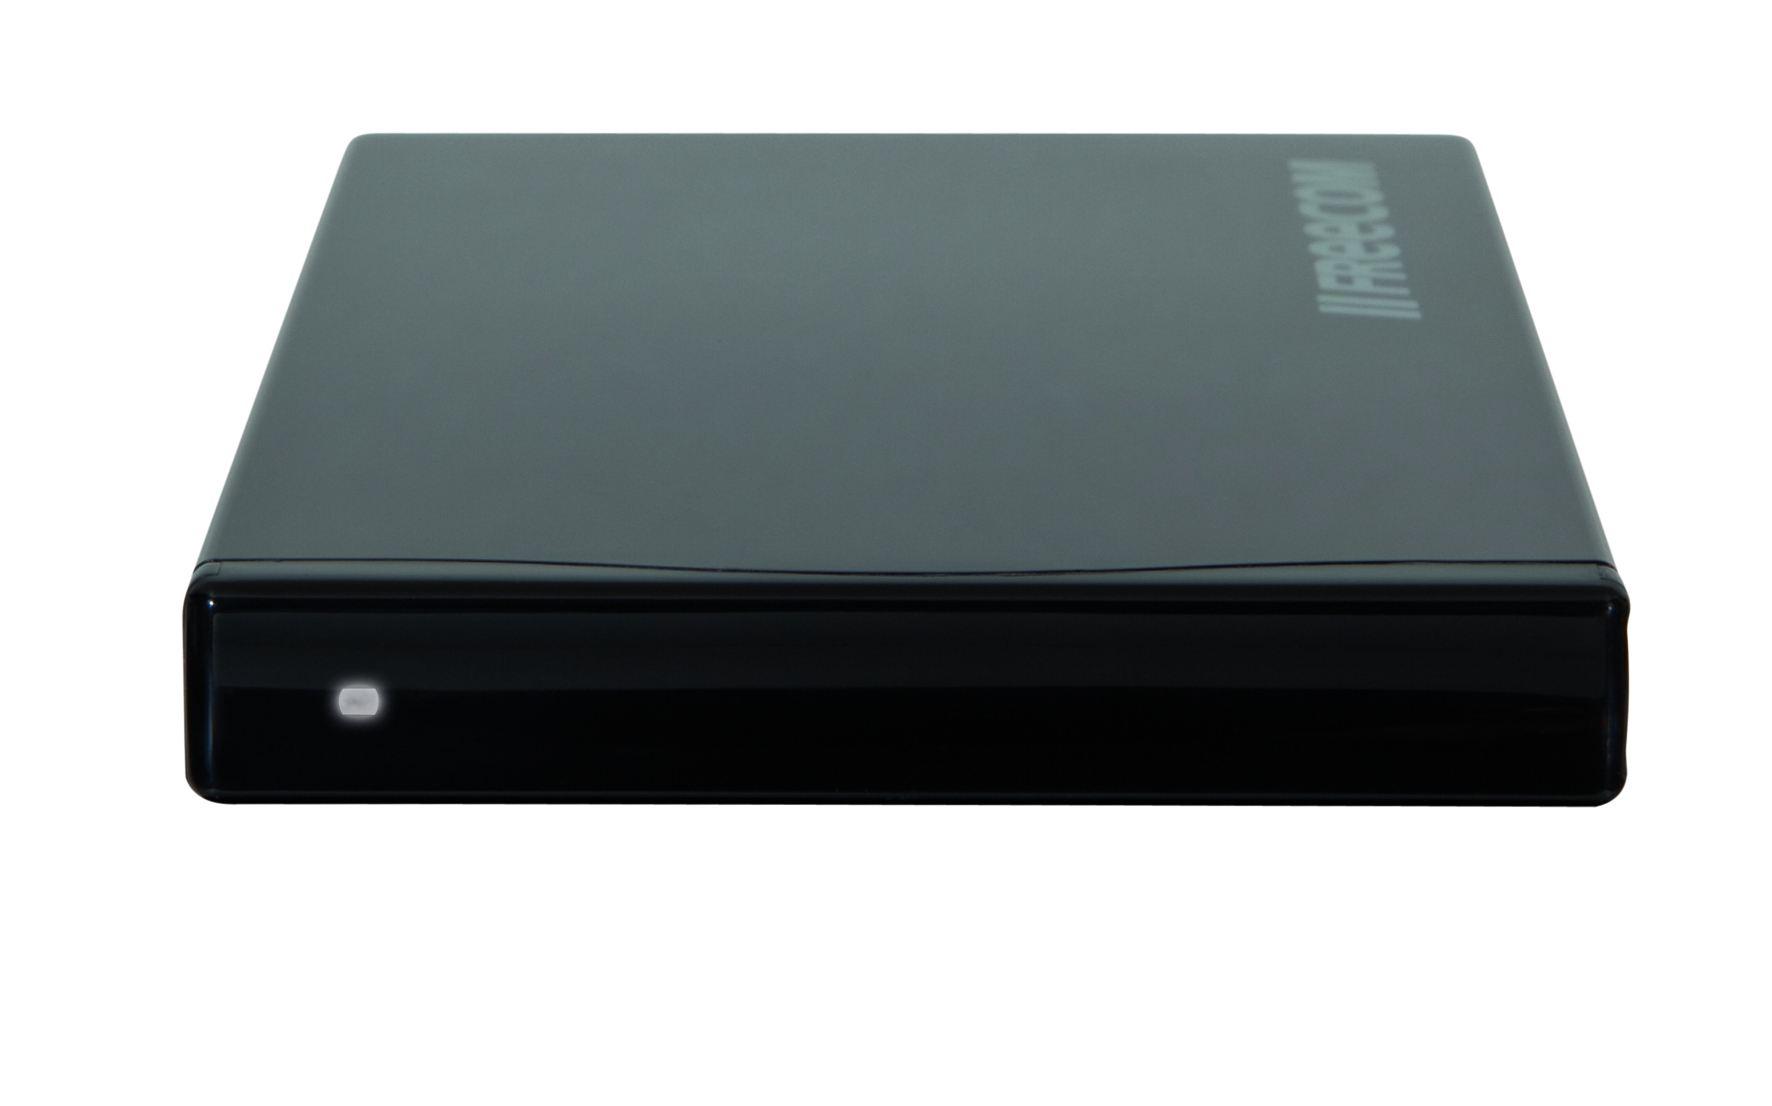 Freecom Mobile Drive Classic Ii 500gb